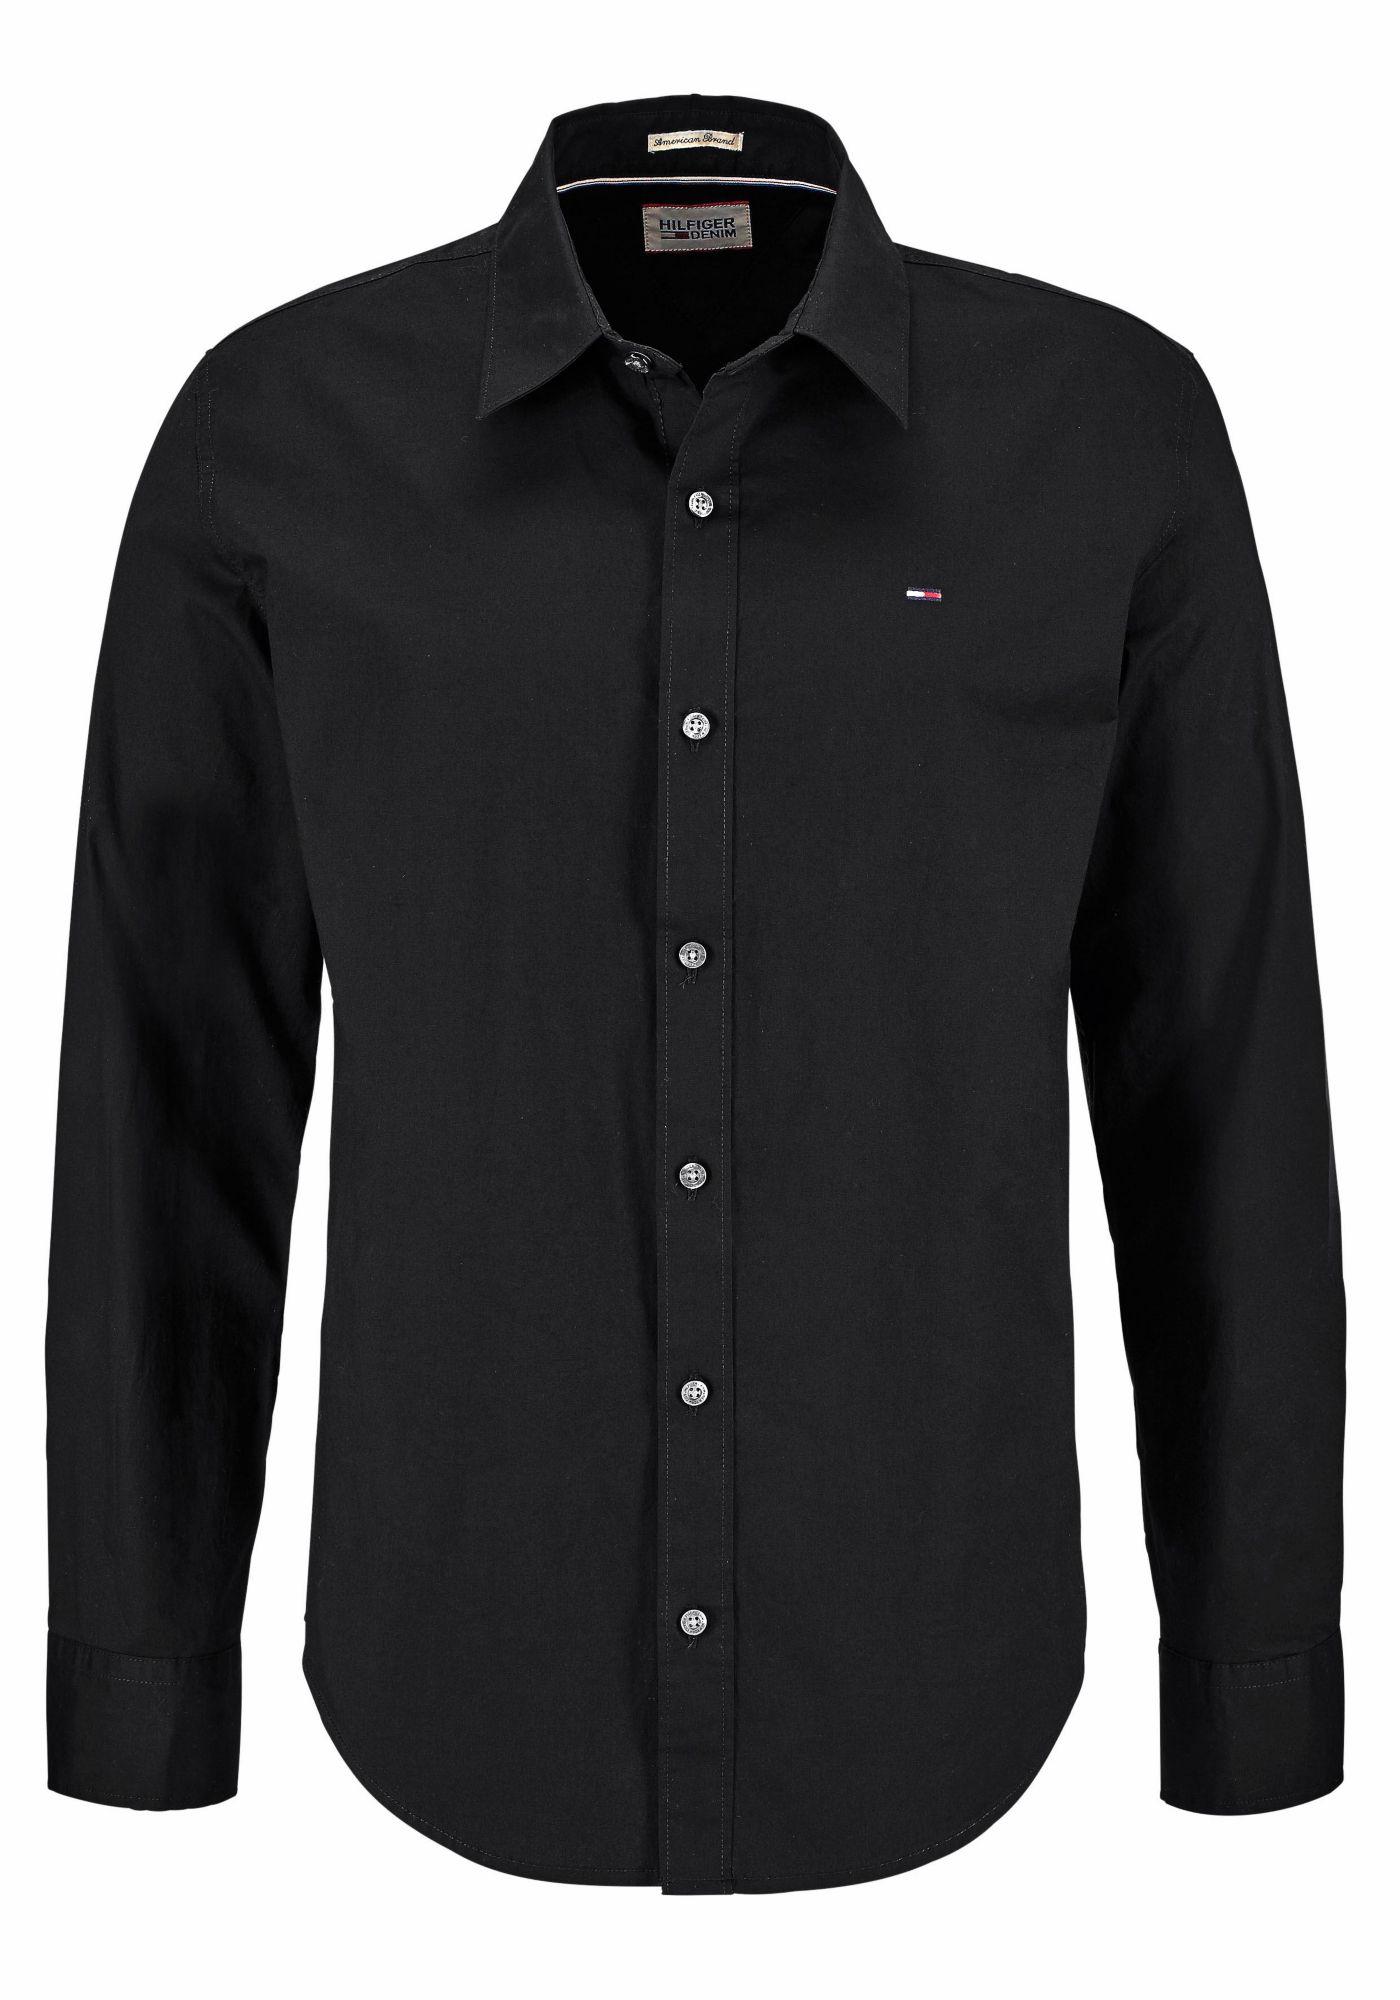 HILFIGER DENIM Hilfiger Denim Hemd »Sabim Shirt«